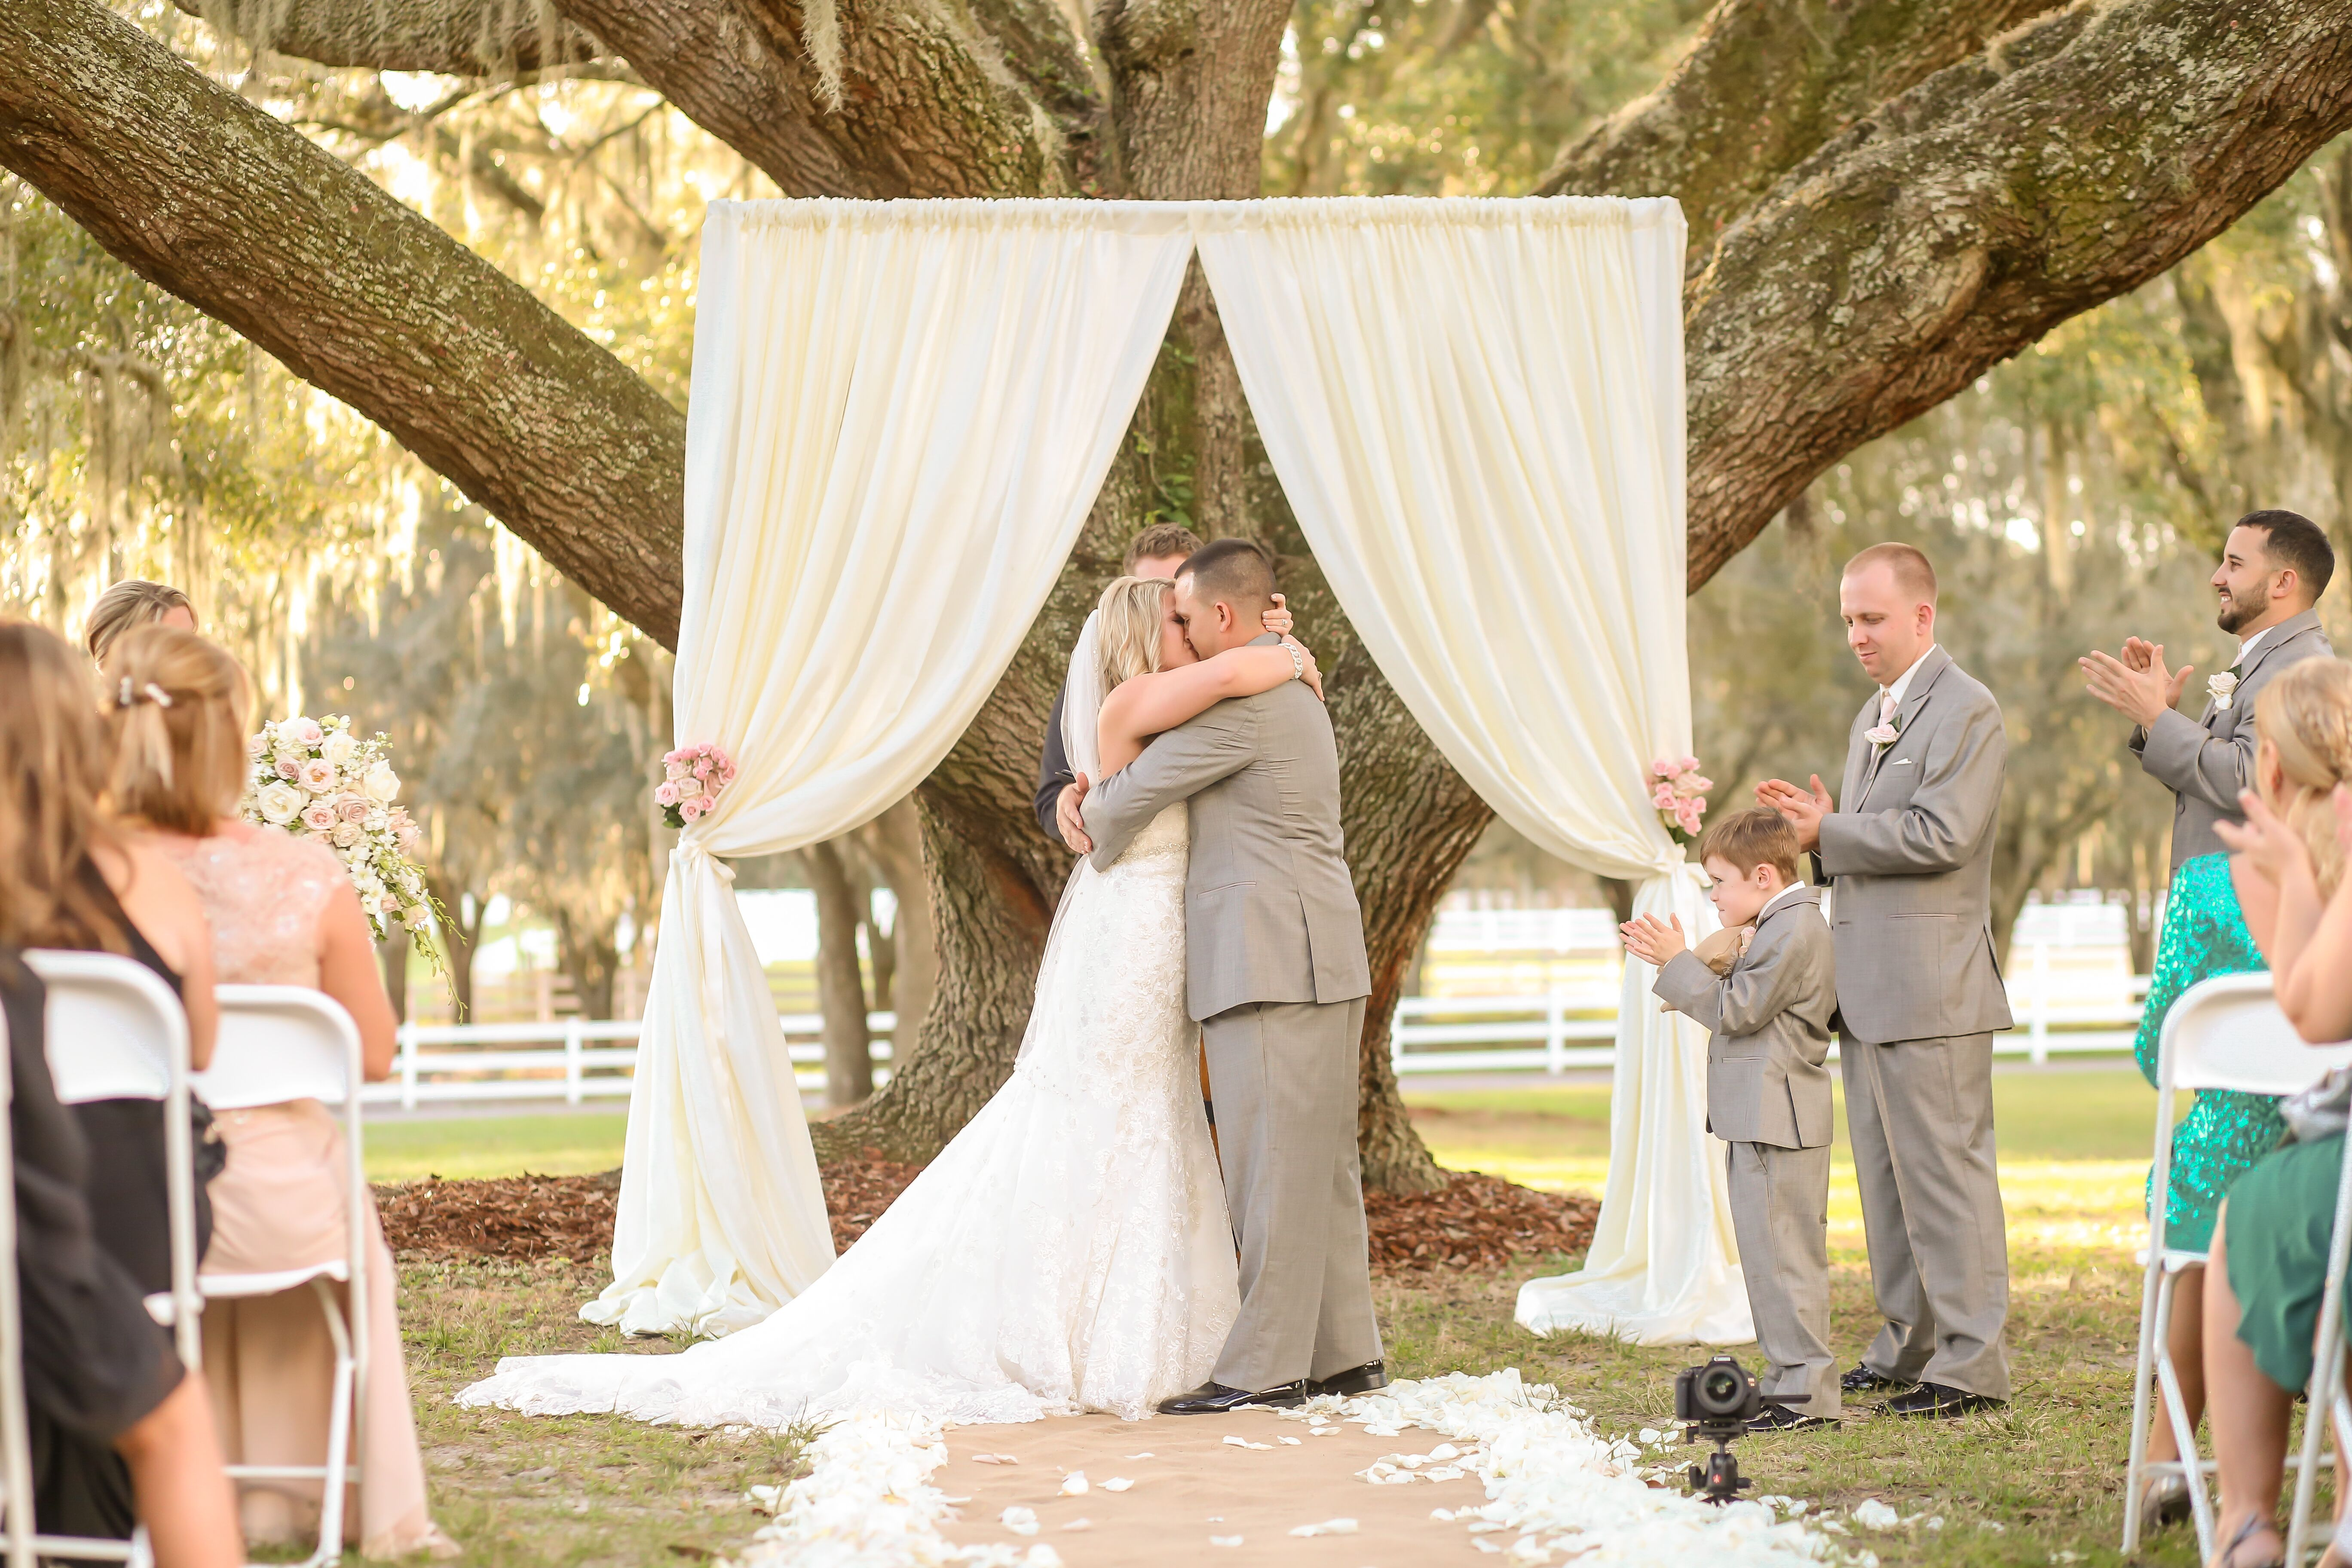 Simple Ivory Fabric Draped Wedding Arch